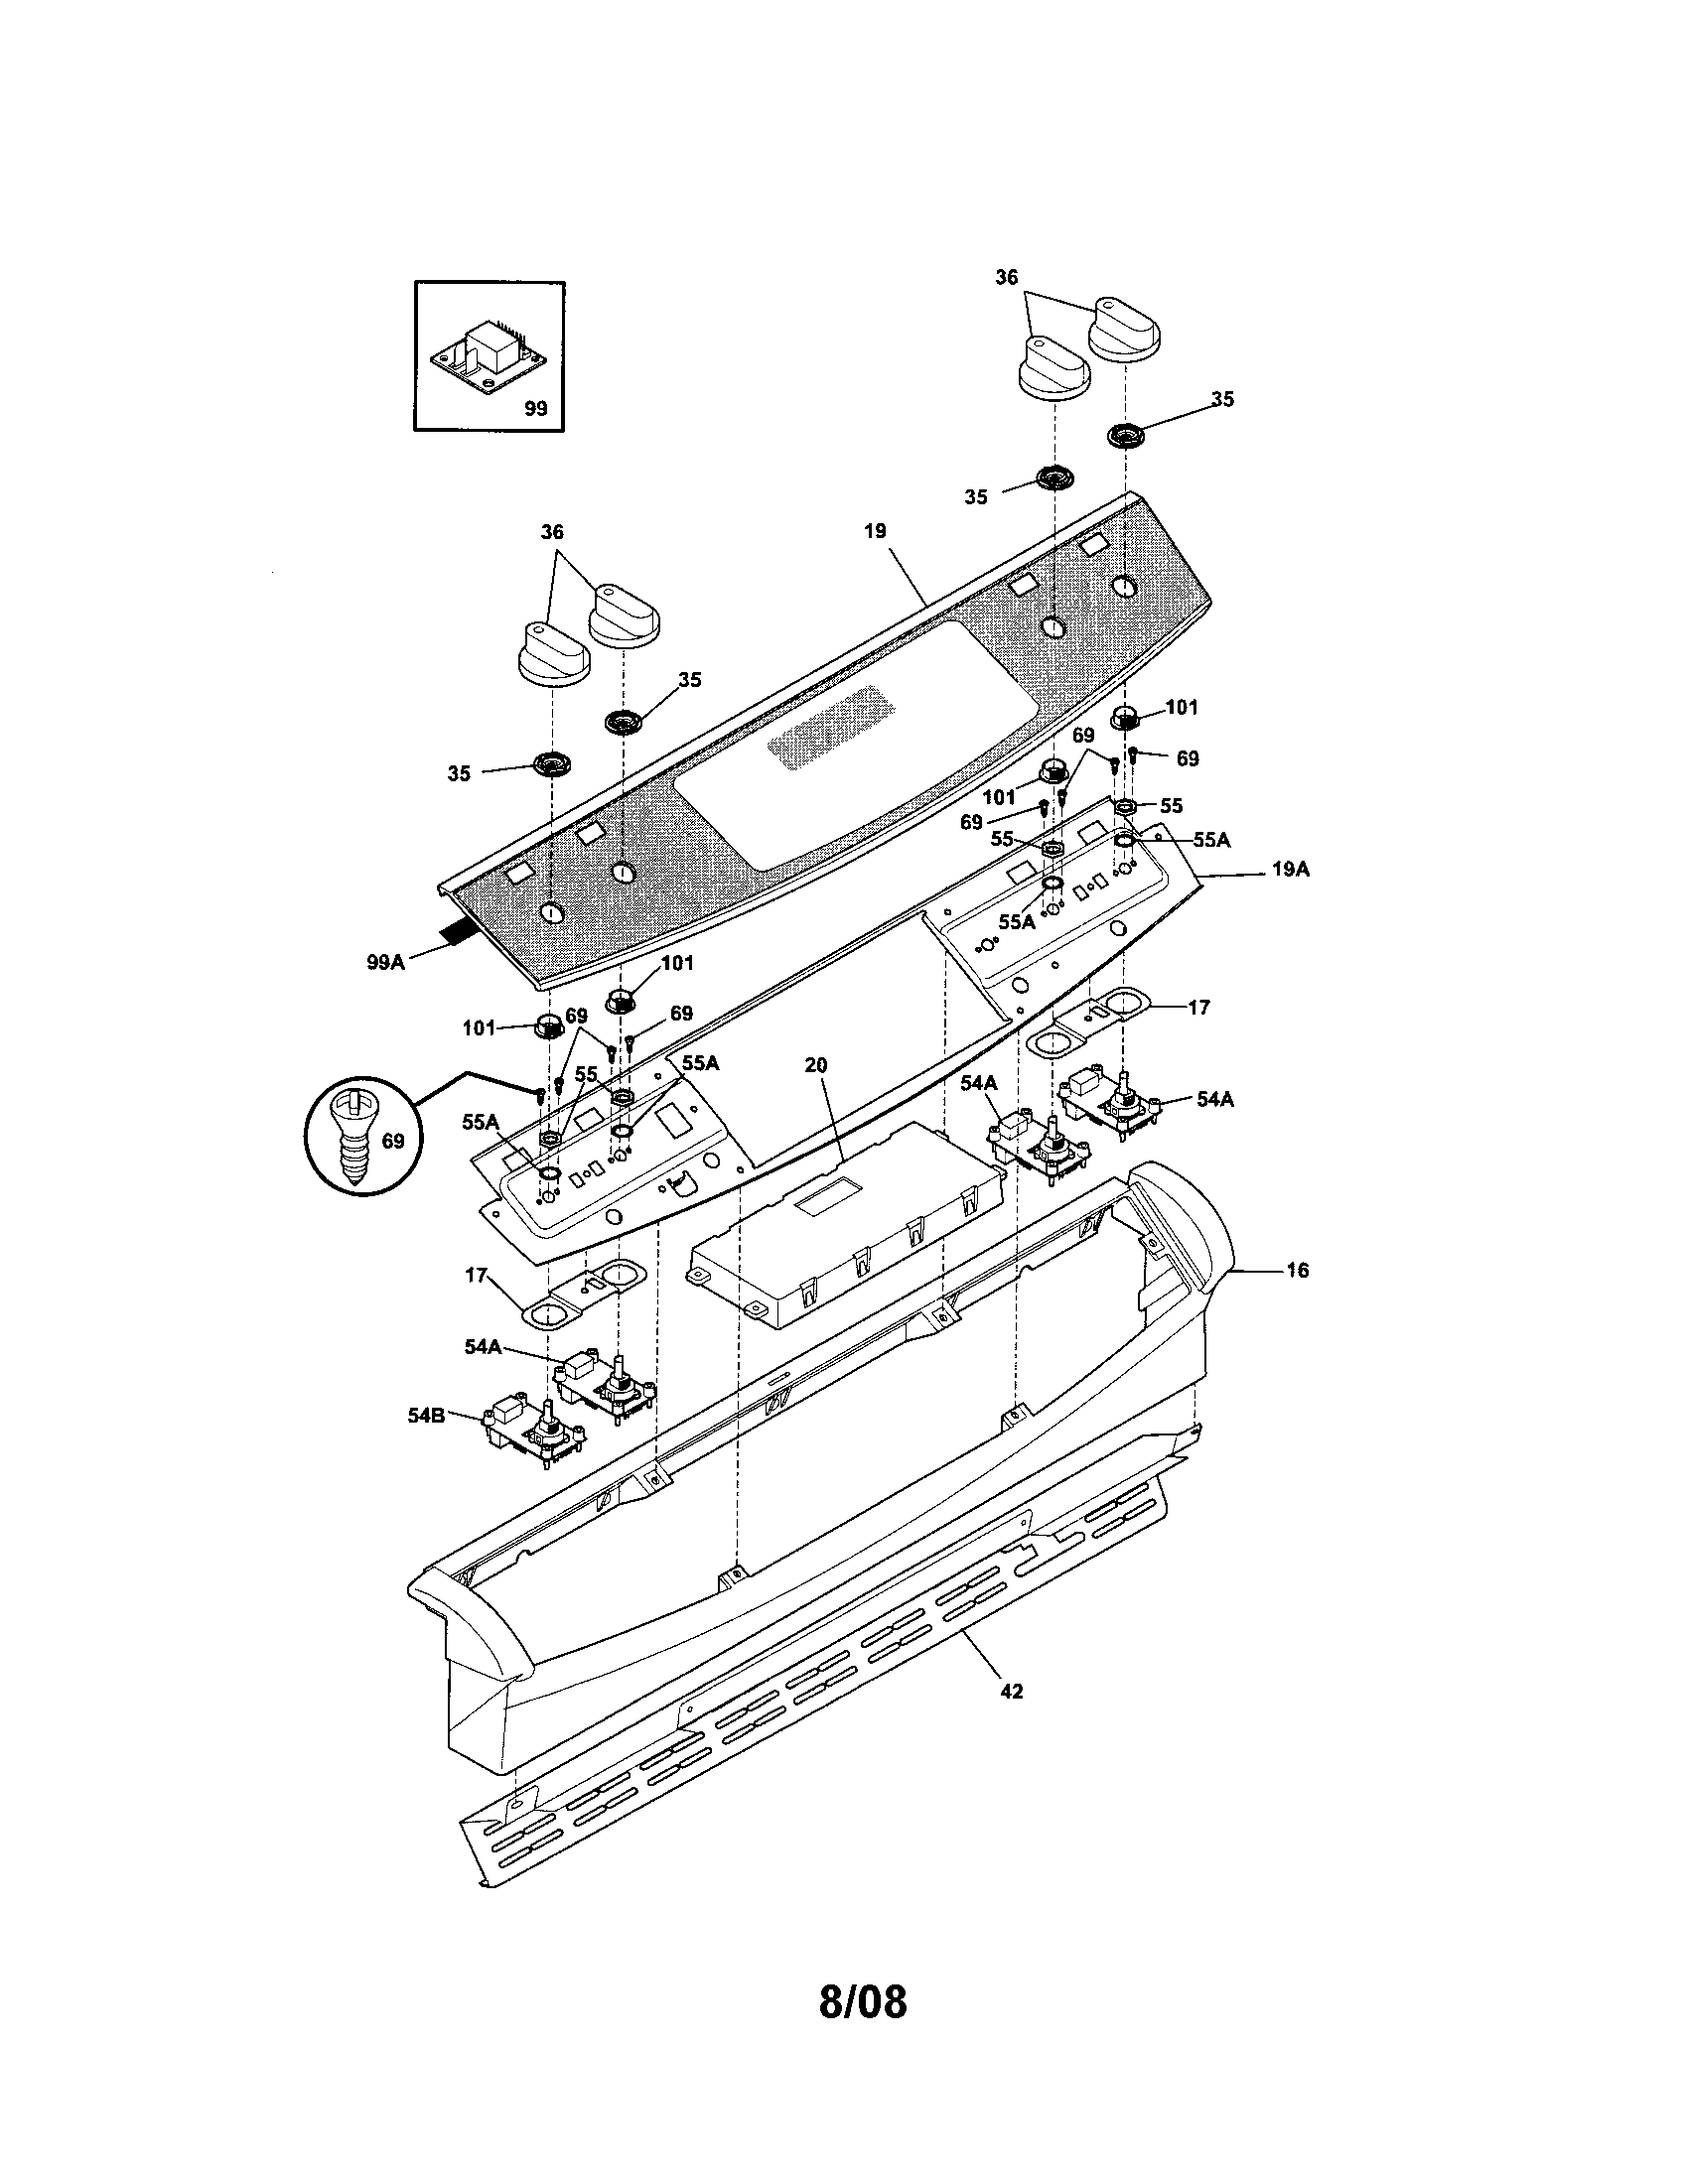 Frigidaire model PLES389ECI slide-in range, electric